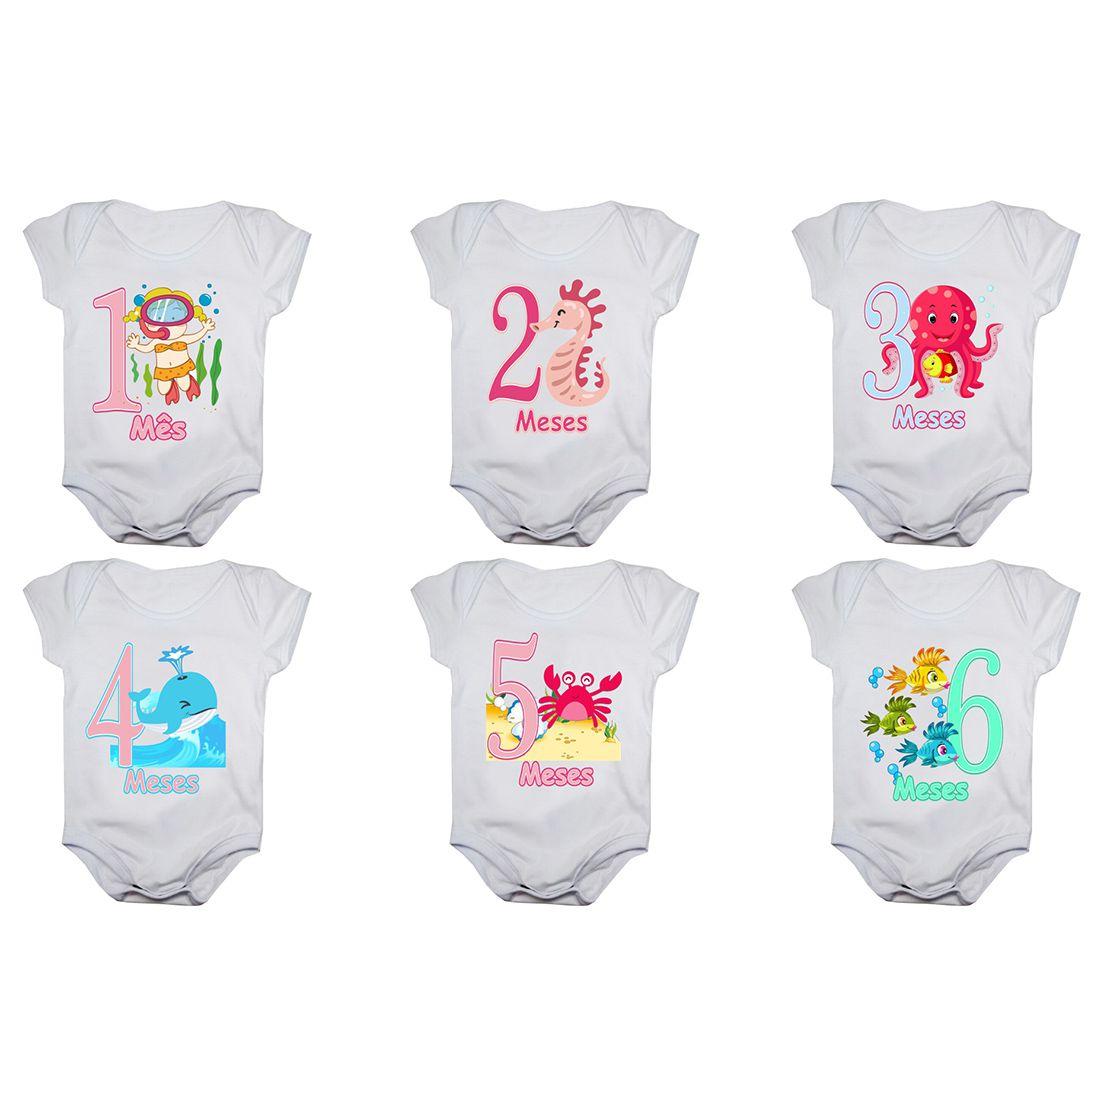 Kit body bebê mesversario manga curta estampa fundo do mar 12 bodies 1 a 12 meses